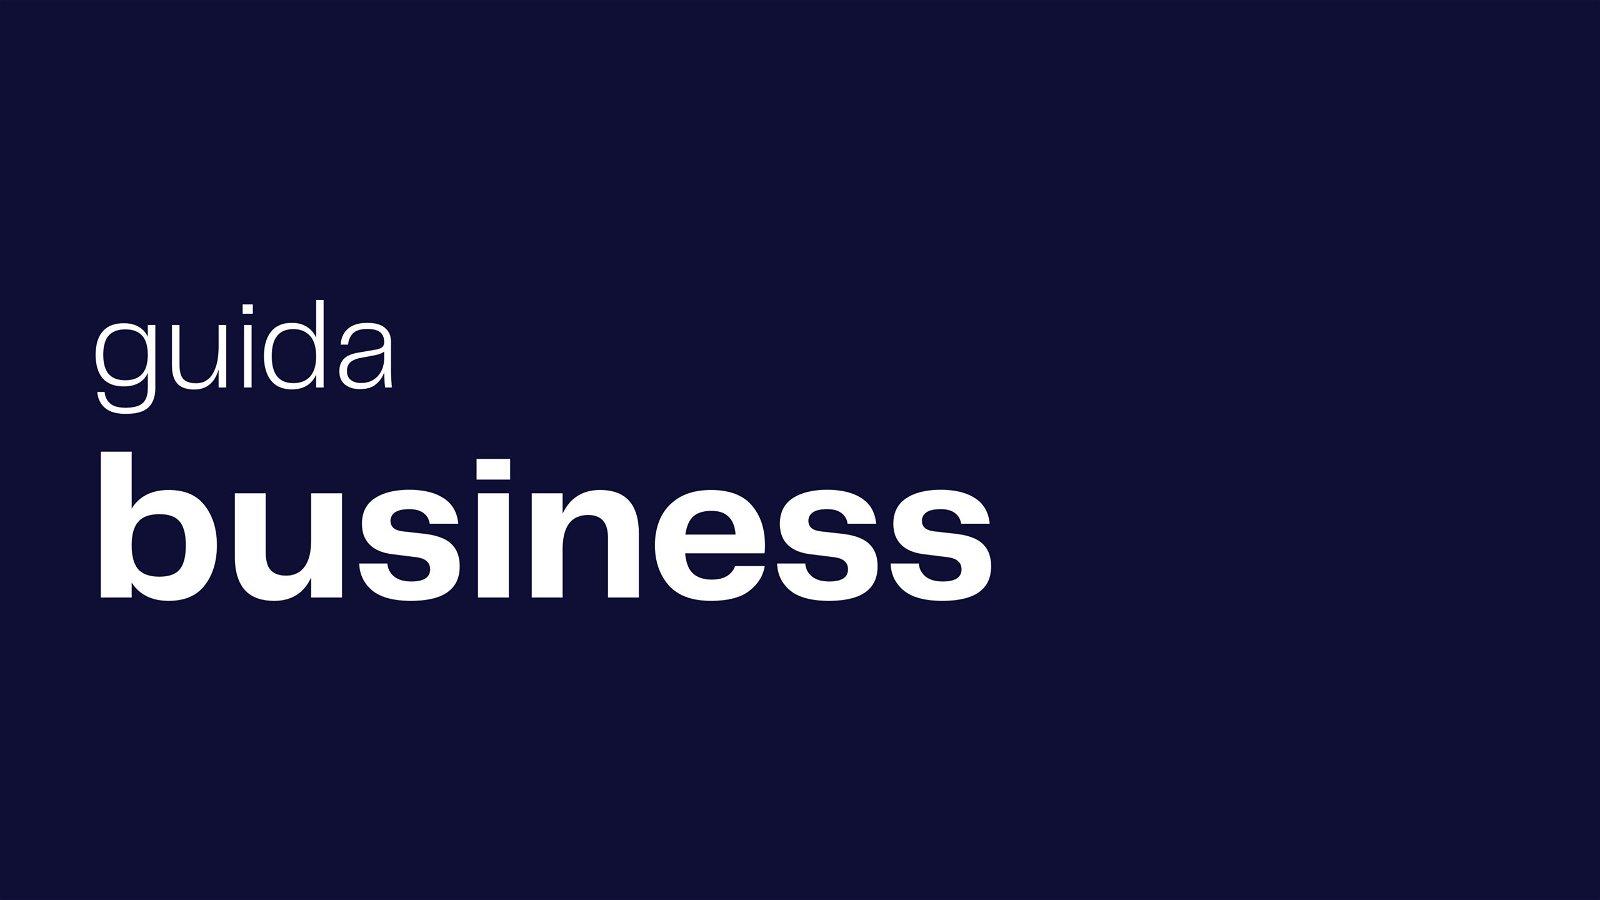 guida business